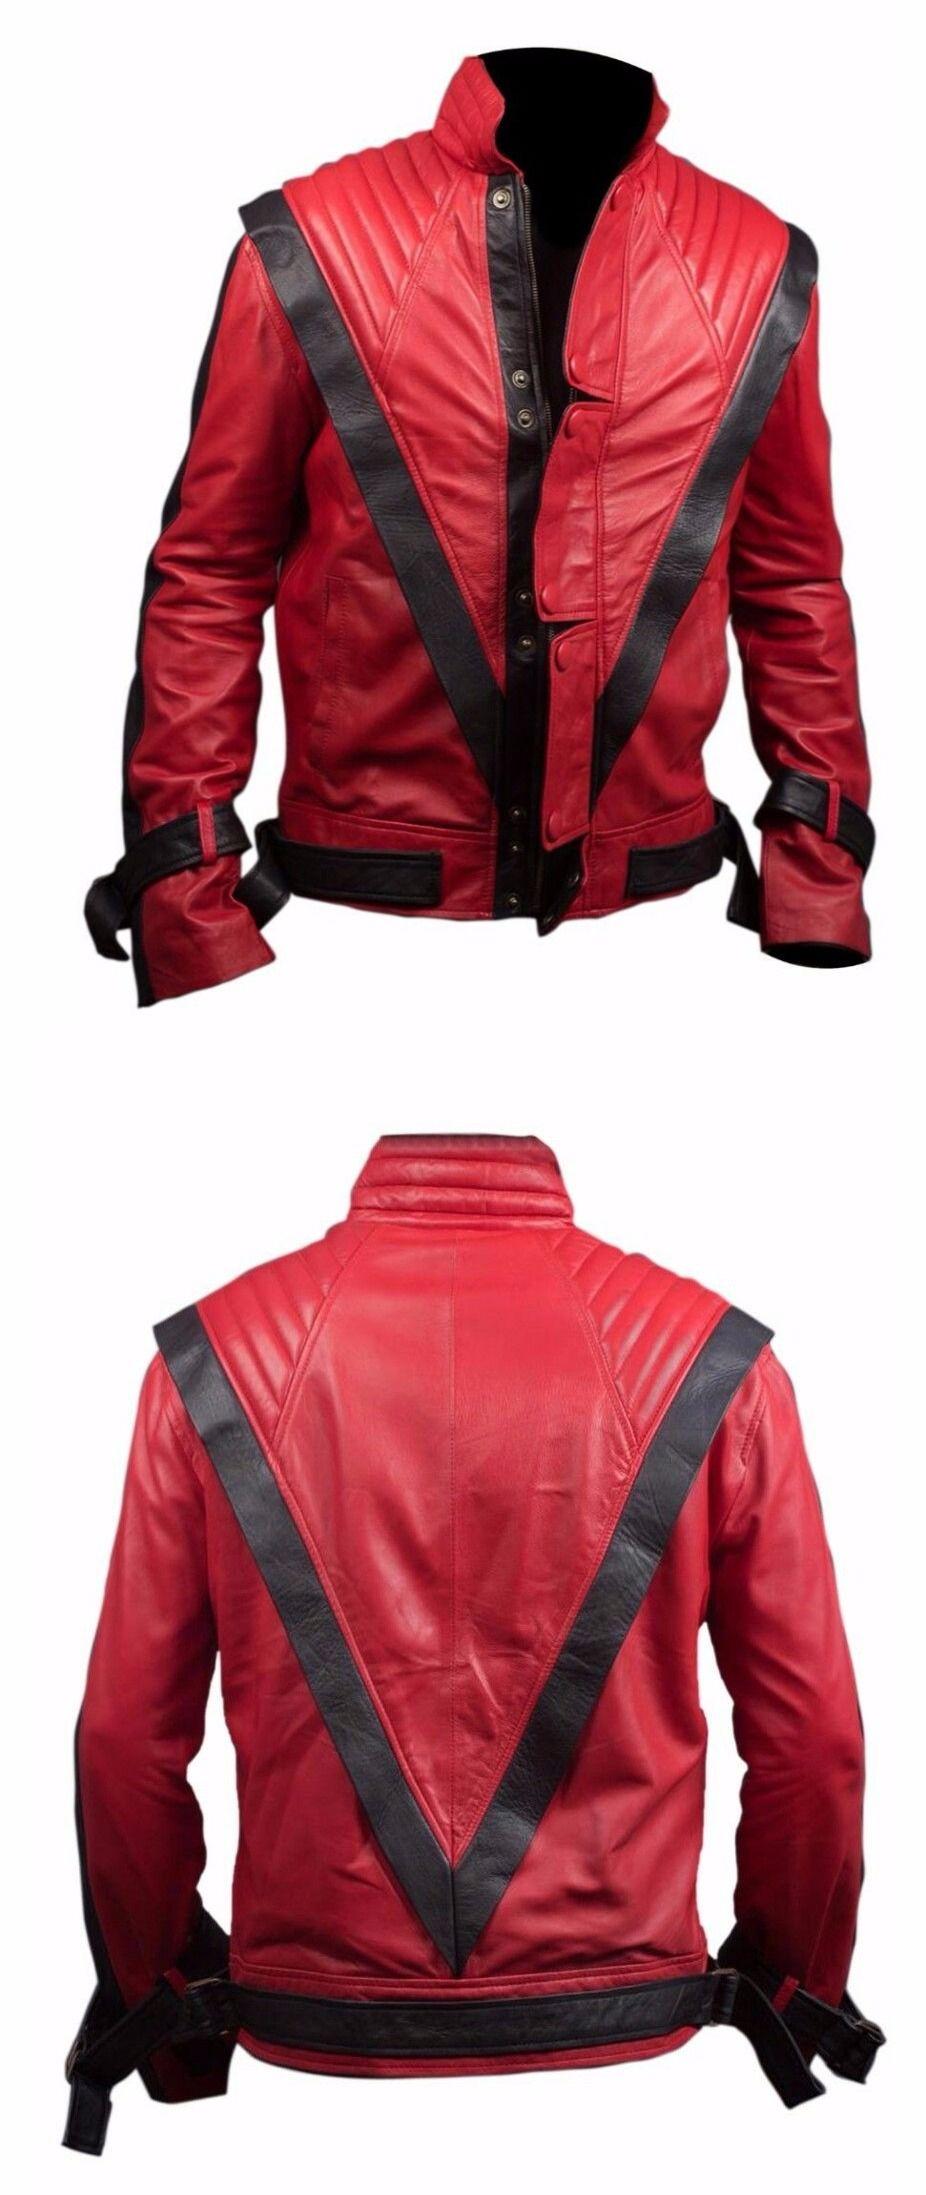 Details about 2Michael Jackson Classic Styles BEAT IT